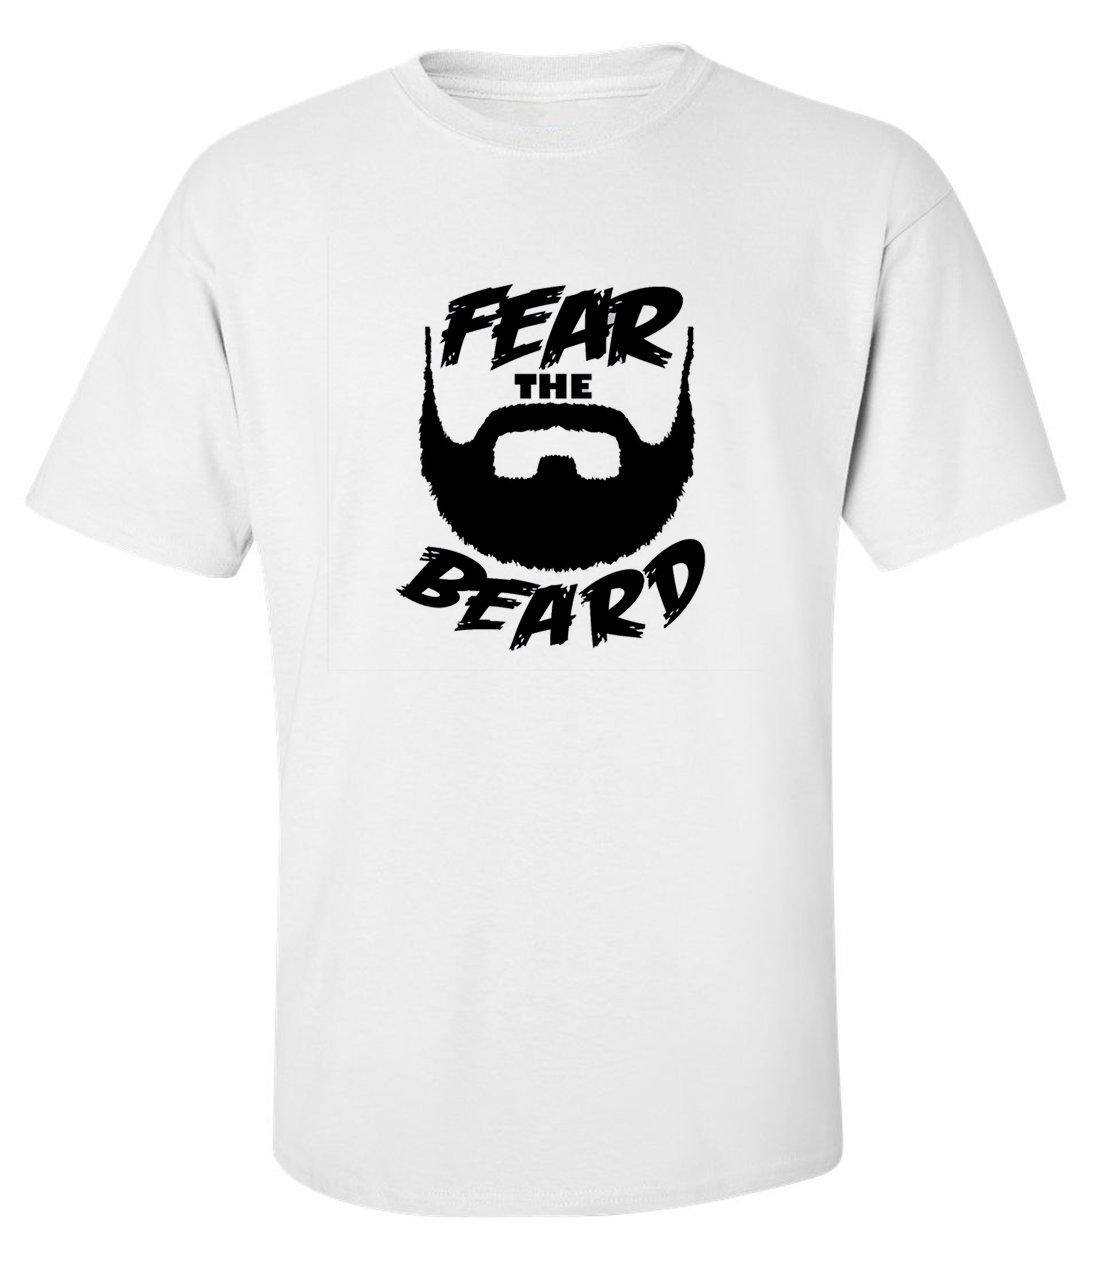 Fear the beard funny slogan men printed cotton white t-shirt size S